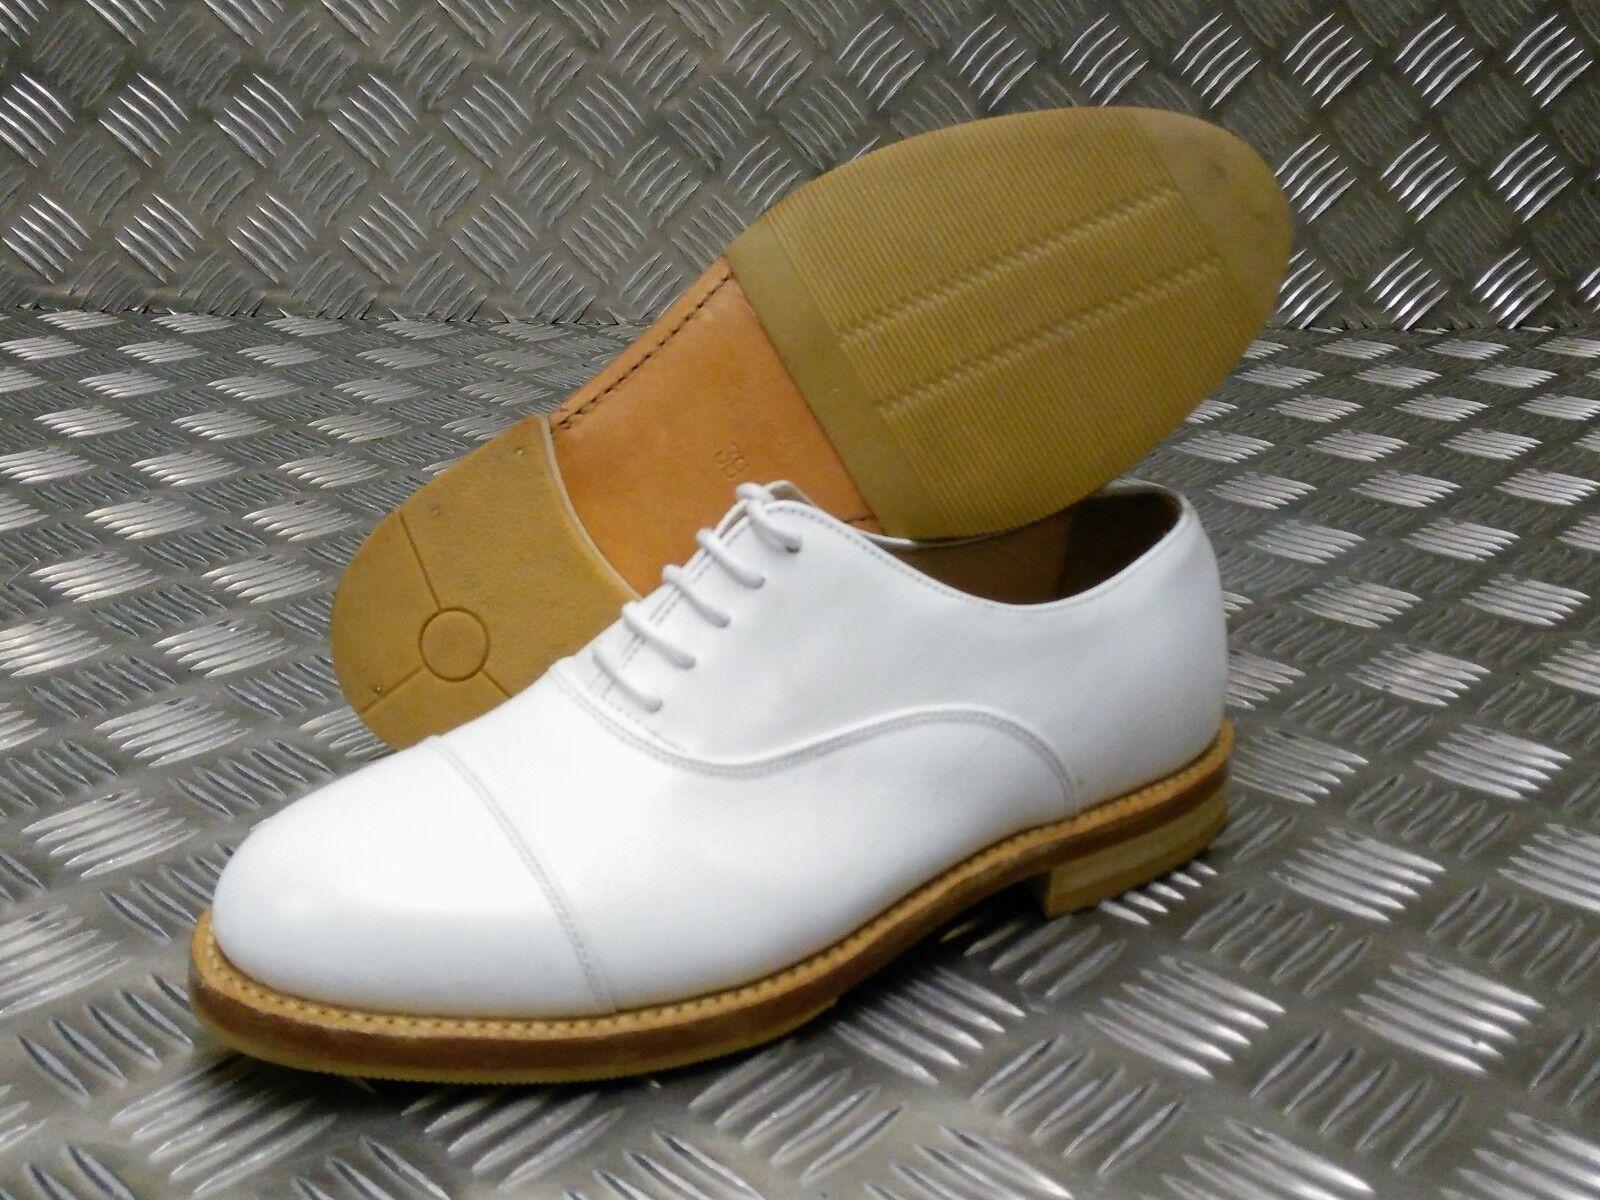 Echt Britisches Militär Ausgegeben Weiß Service Parade Schuhe Lederschuhe